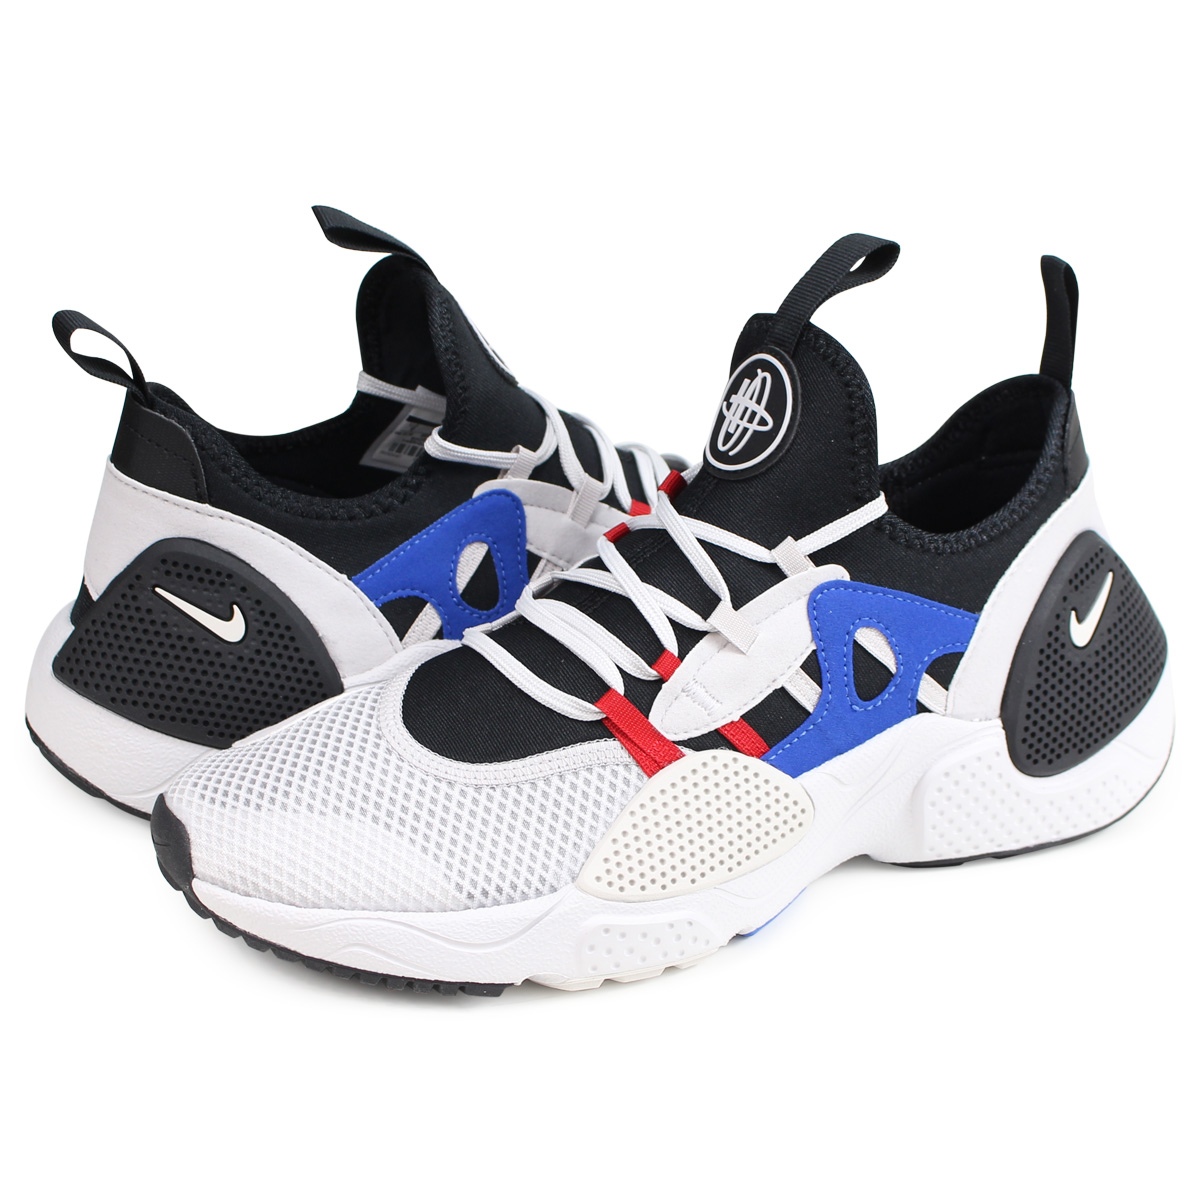 4ff3390cb6a4 Nike NIKE エアハラチスニーカーメンズ AIR HUARACHE NIKE HUARACHE E.D.G.E. TXT white  AO1697-001  load planned Shinnyu load in reservation product 2 14 ...